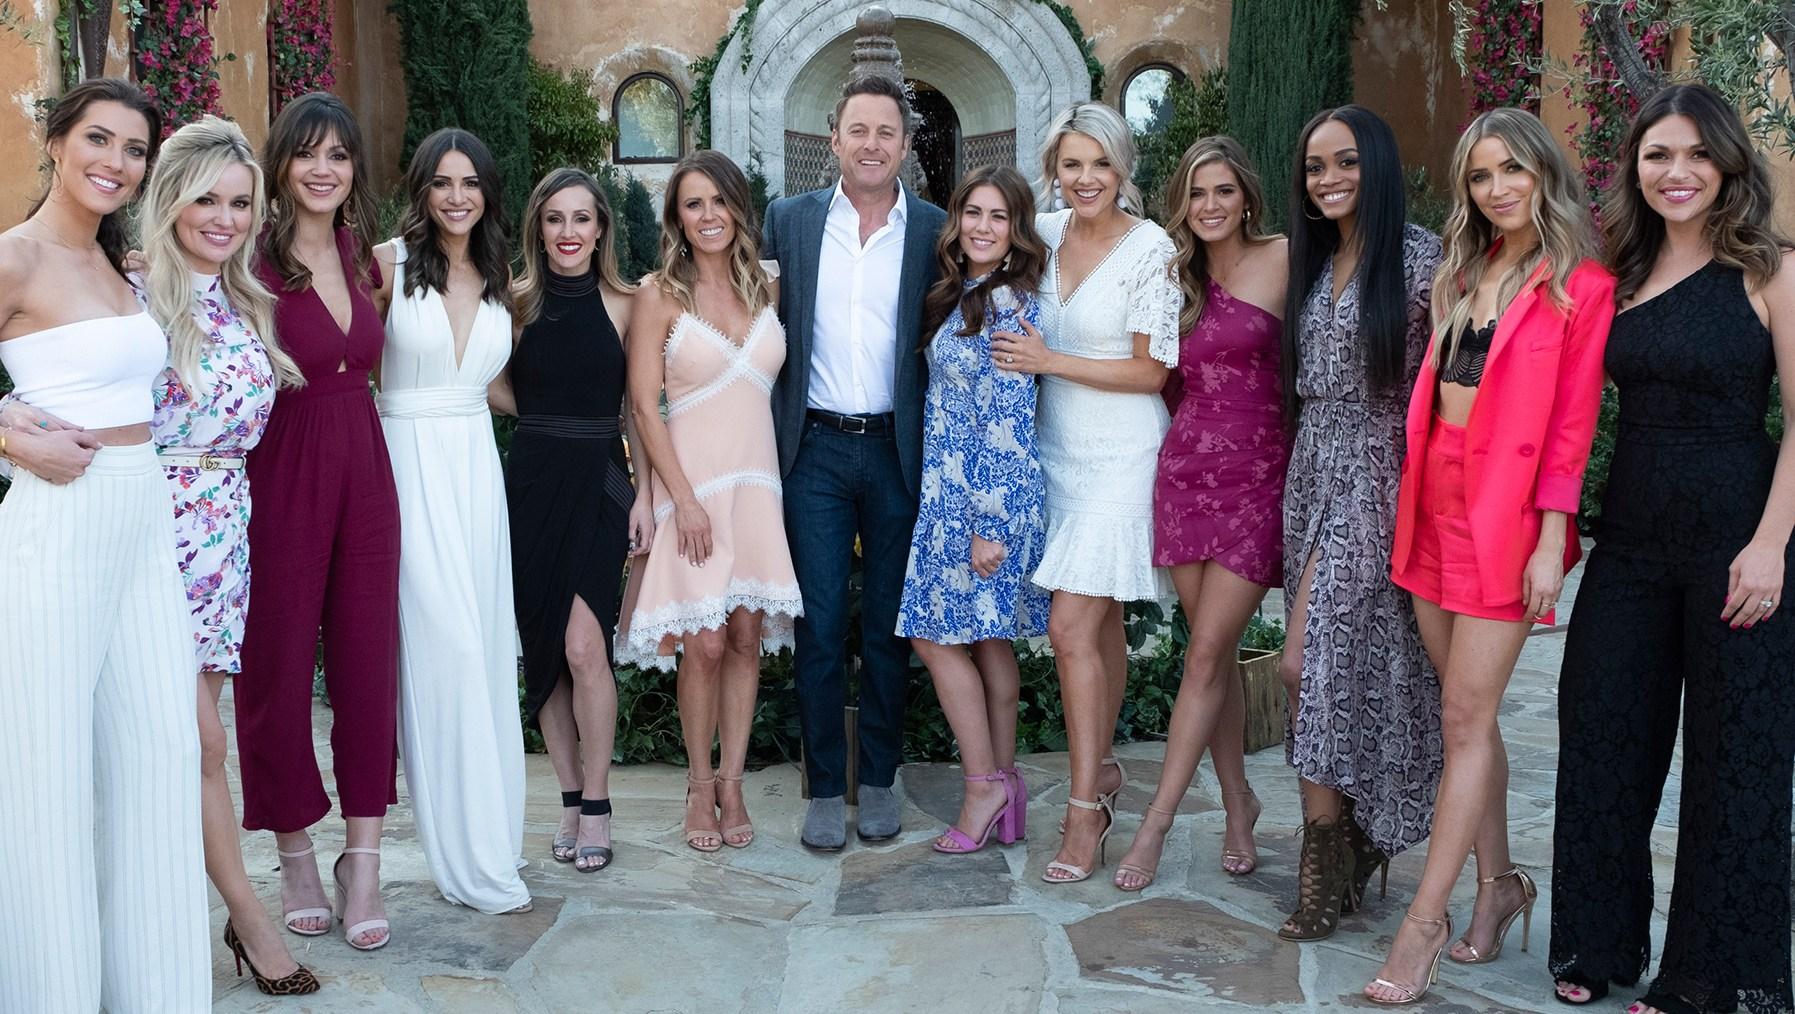 Inside 'The Bachelorette' Reunion Special